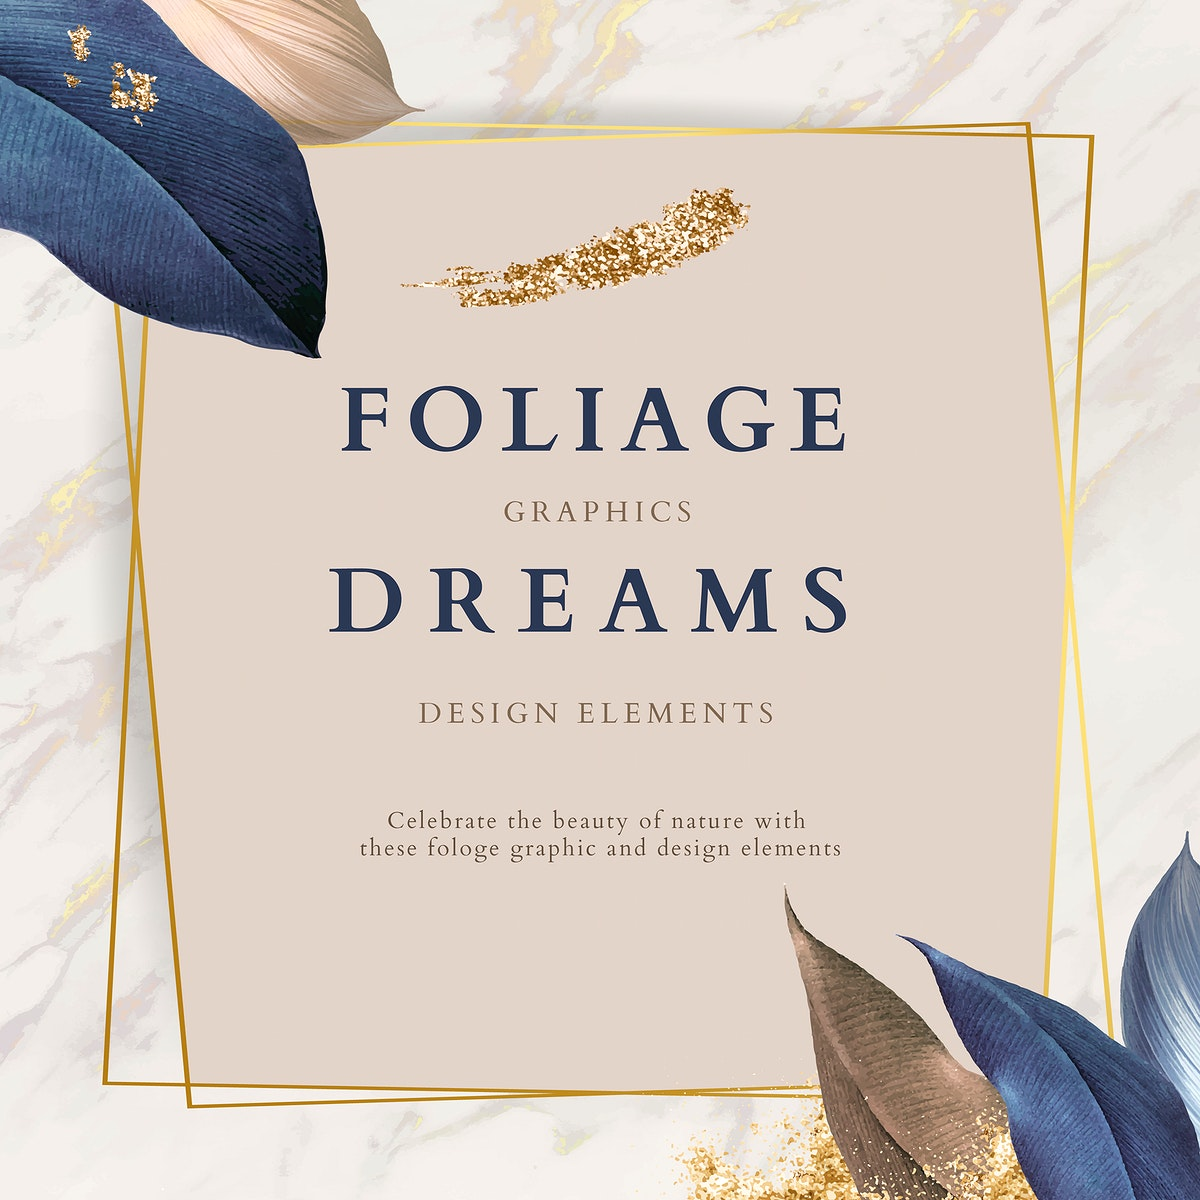 Foliage dreams design elements vector